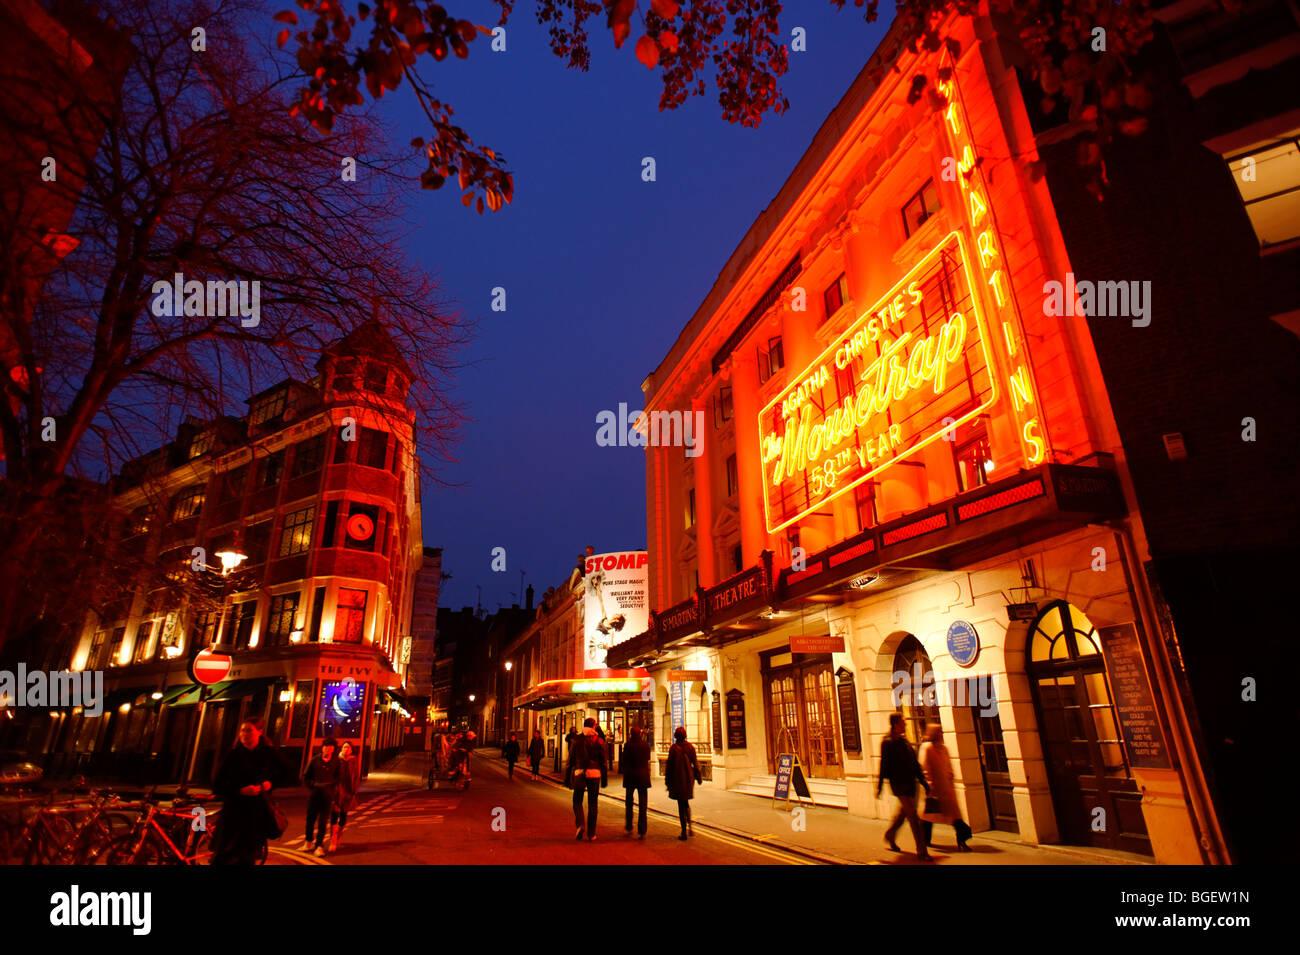 St Martins theatre. London. UK 2009. - Stock Image